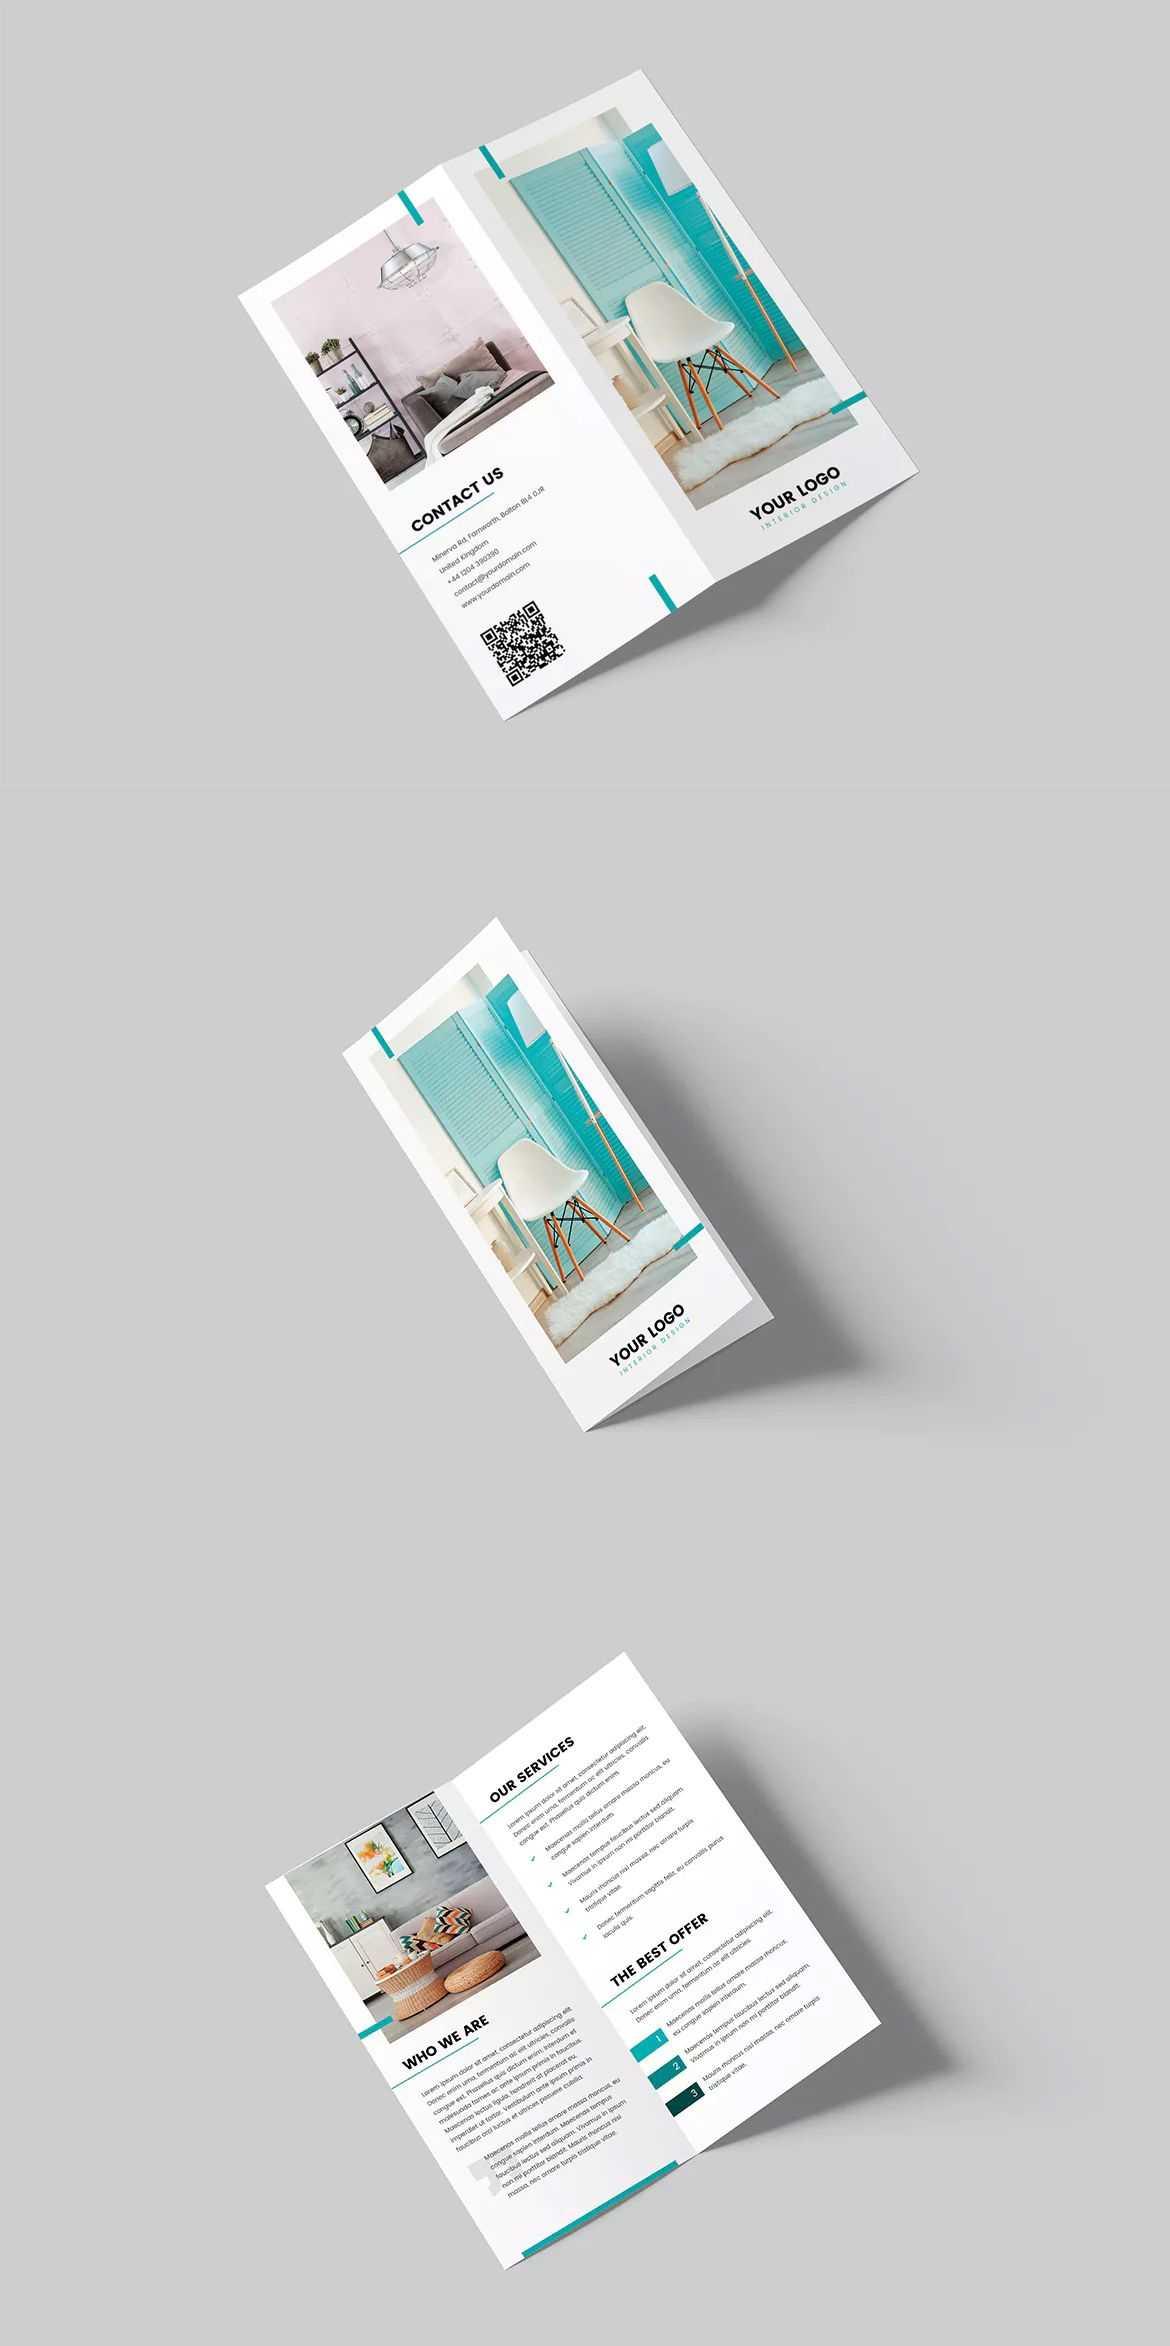 Pin On Brochure Design Templates with regard to Hotel Brochure Design Templates